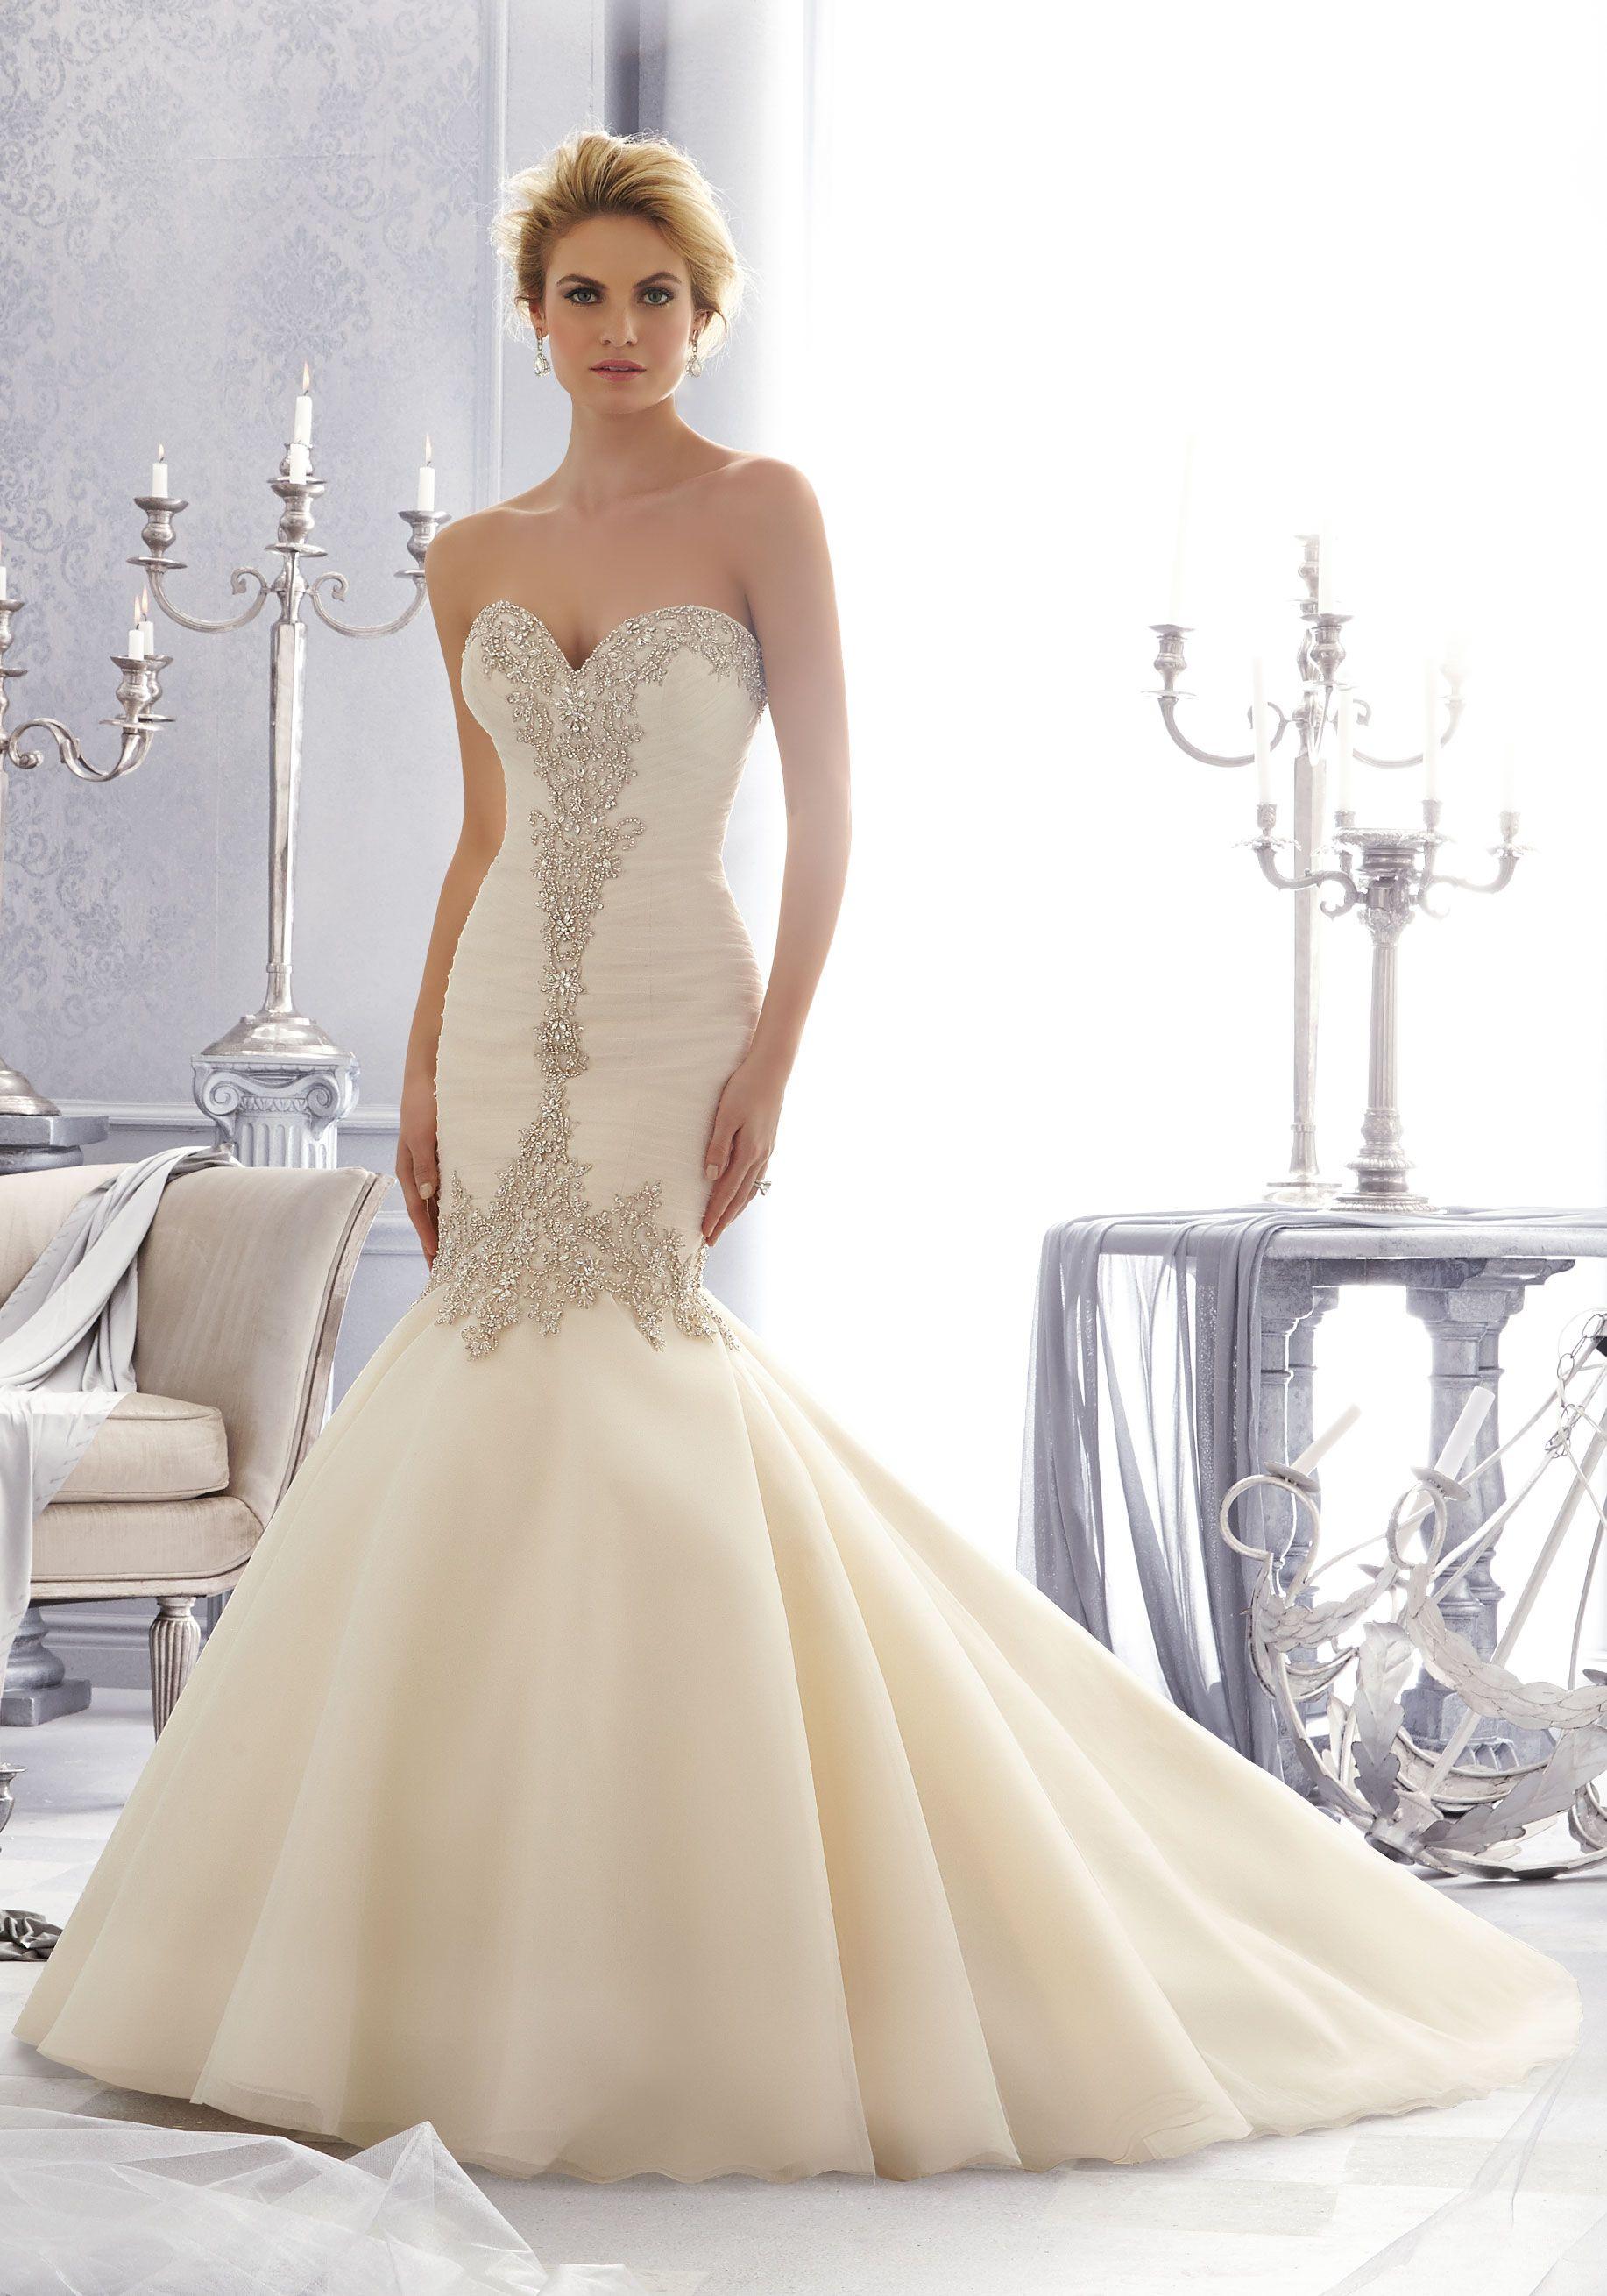 e3ccd8e561bc Morilee Bridal Diamante Beaded Embroidery on Tulle Bridal Dress